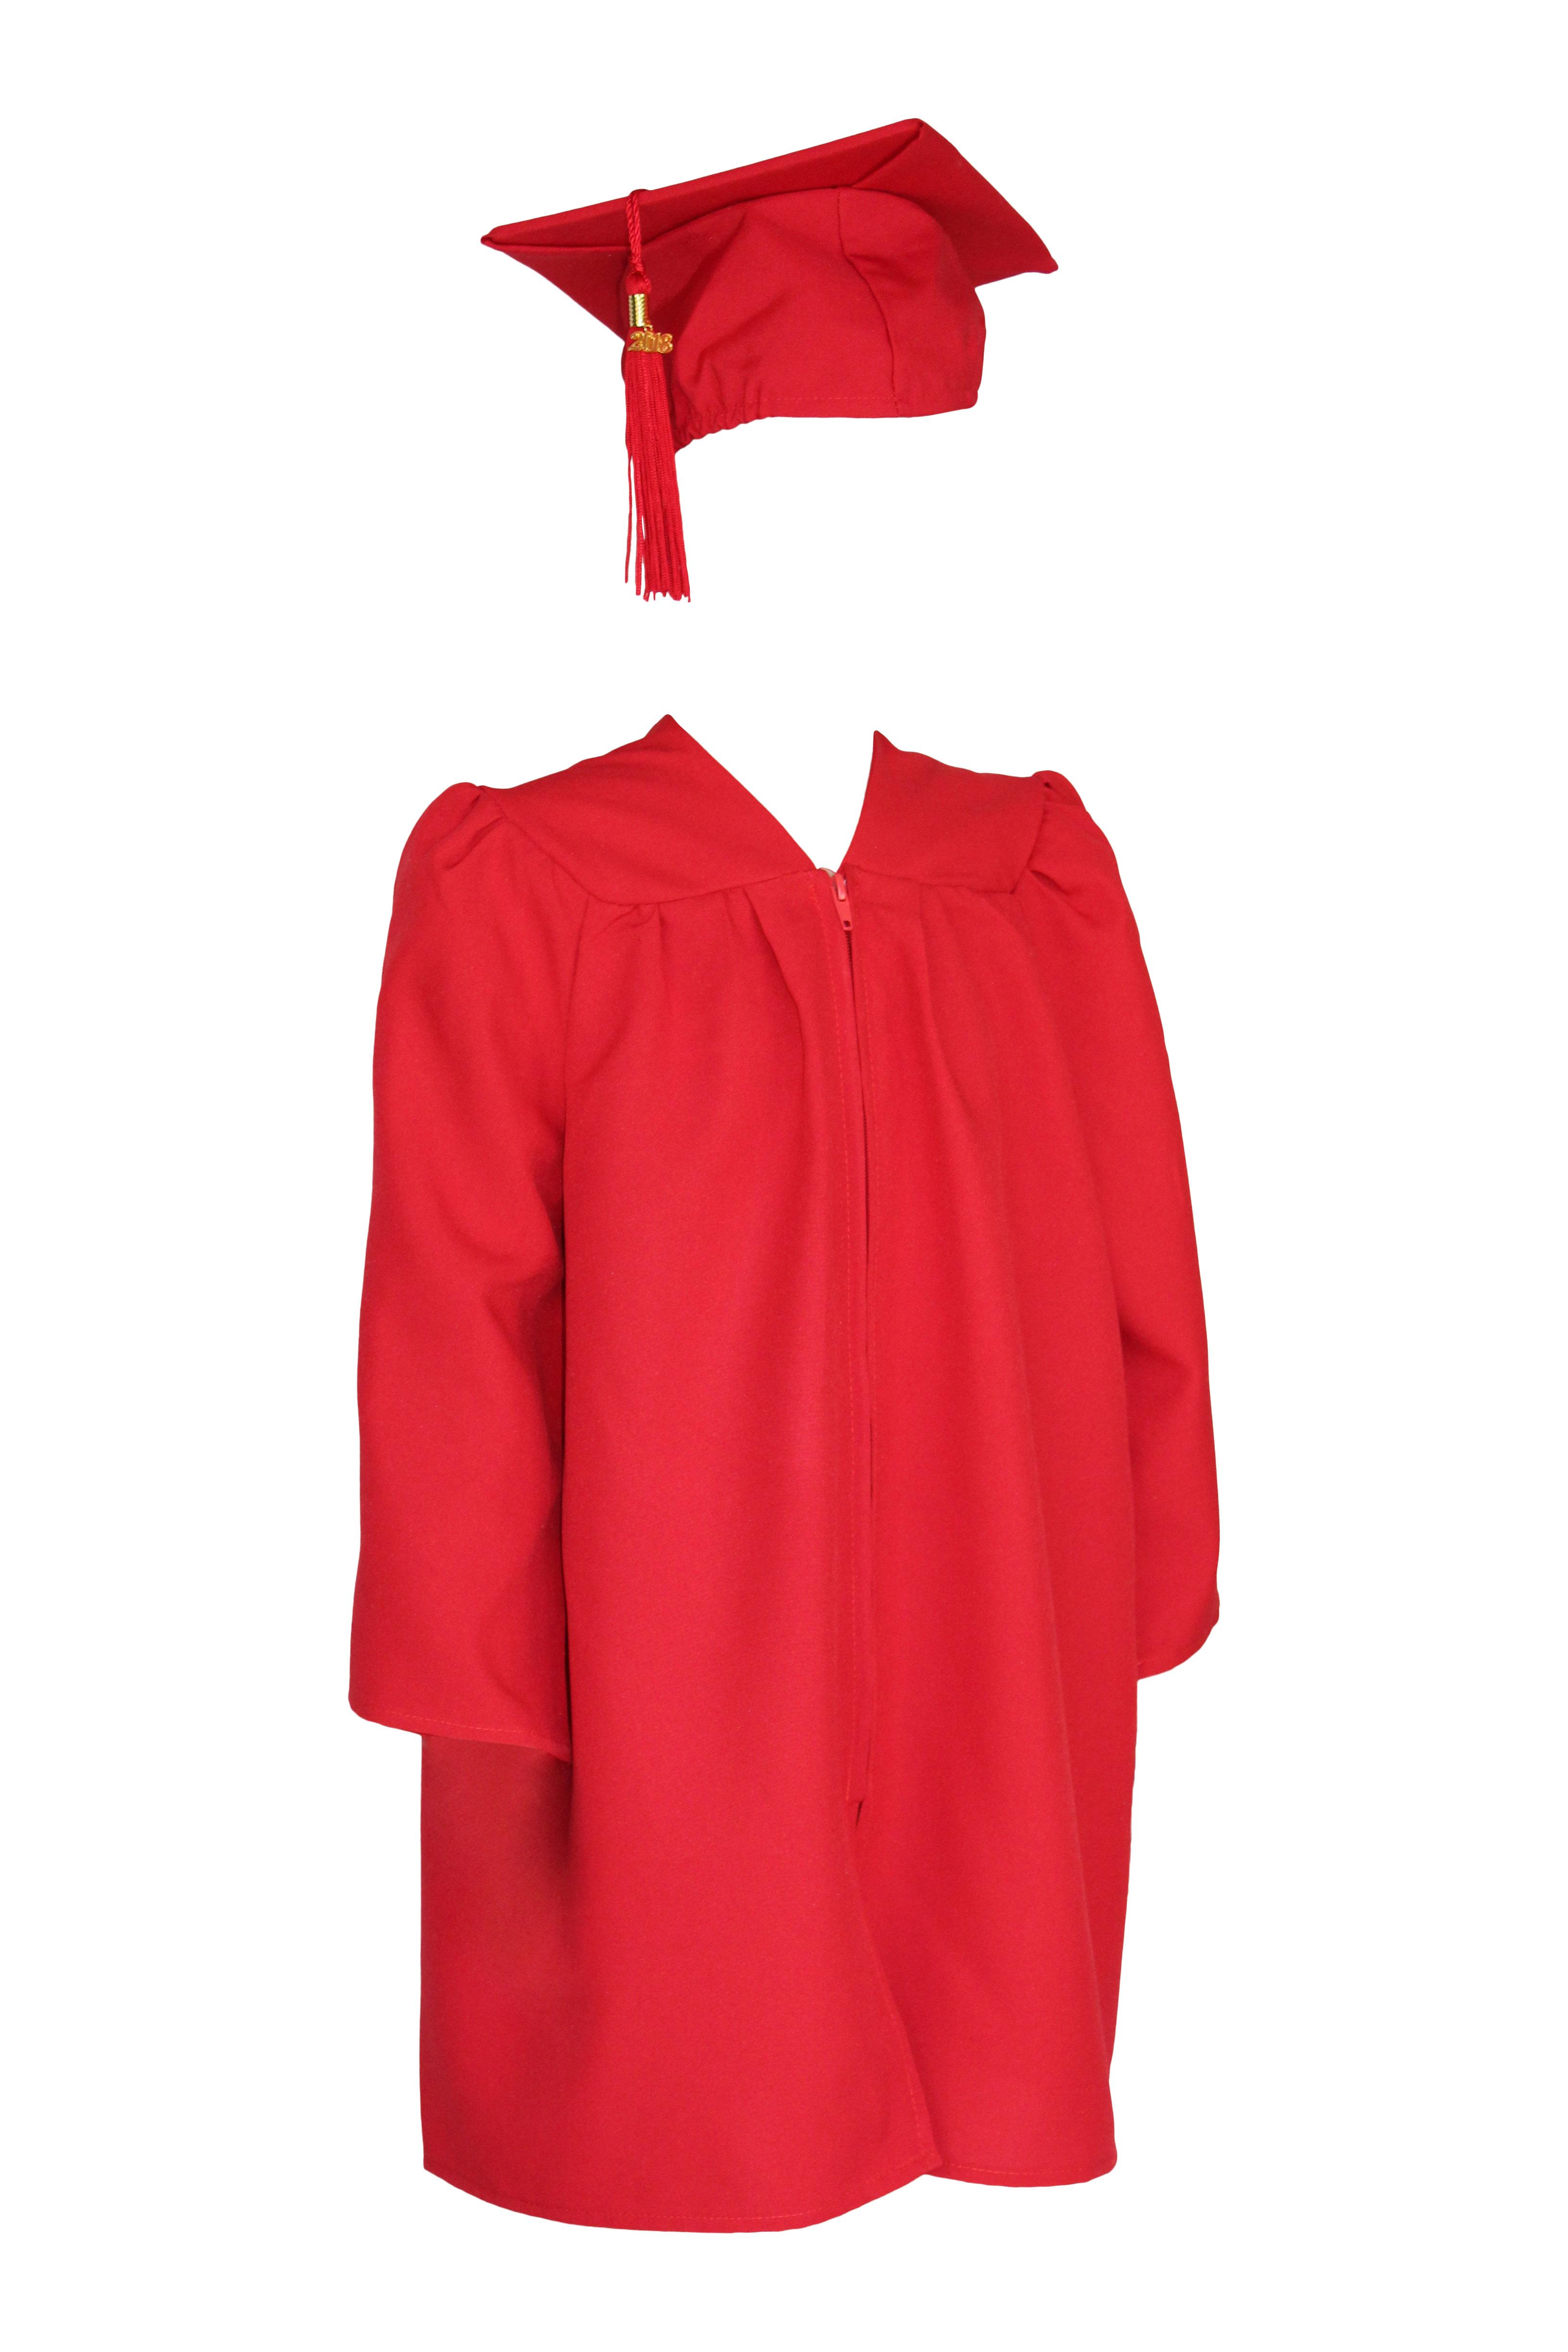 Preschool Cap and Gown – Red Matte | Celtic Graduations